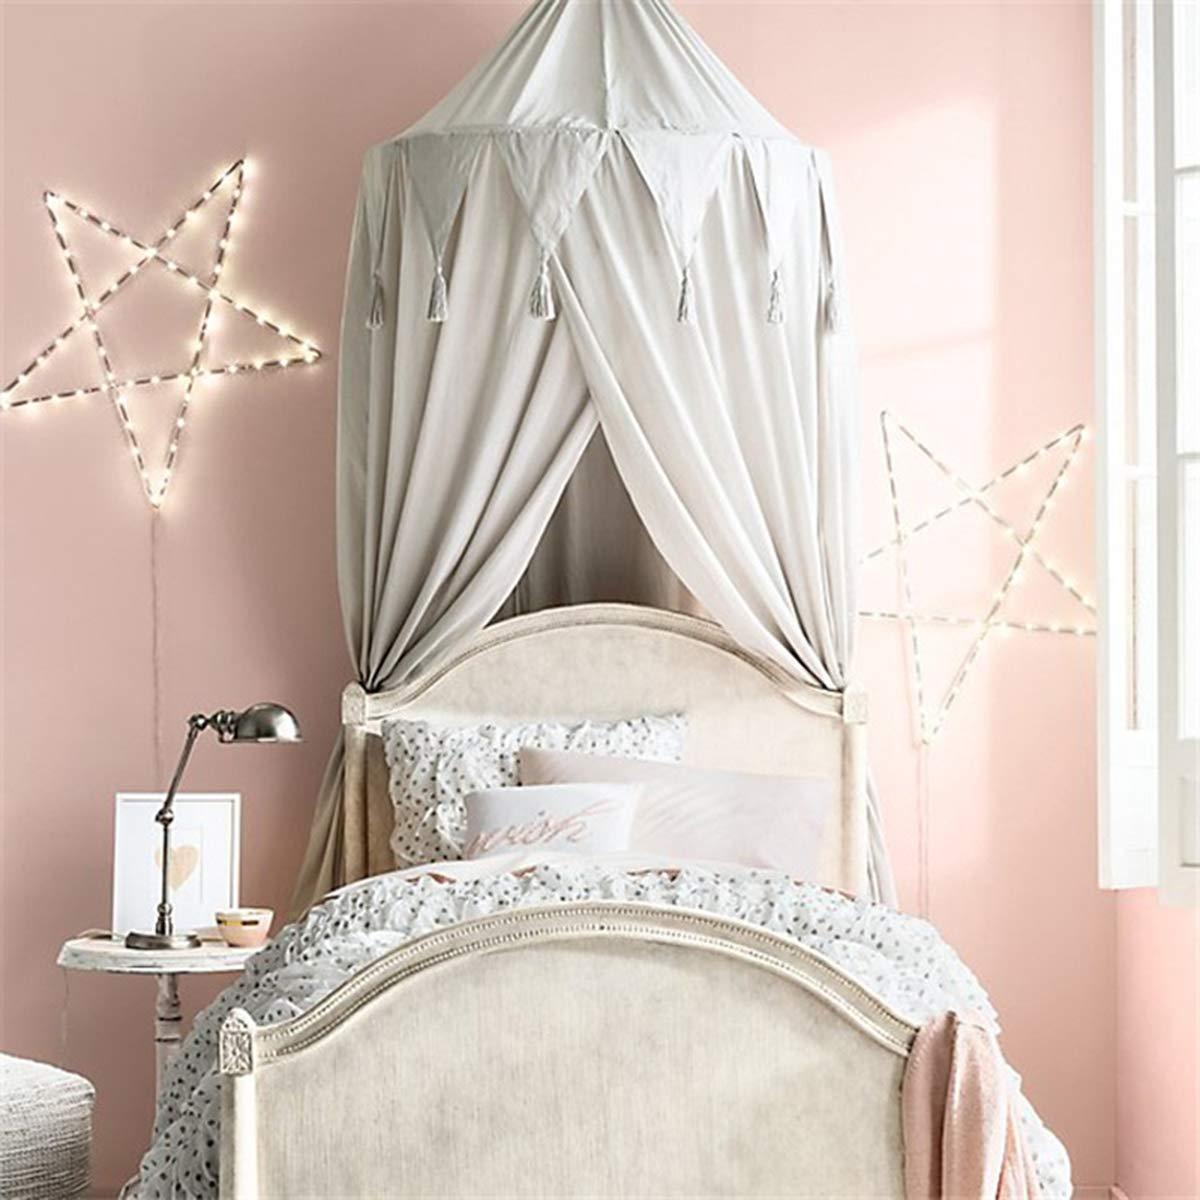 Benradise Dosel de cama para beb/é altura 240 cm blanco Blanco decoraci/ón mosquitera dosel de cama gasa de ensue/ño ni/ña carpa de princesa leer//juego c/úpula